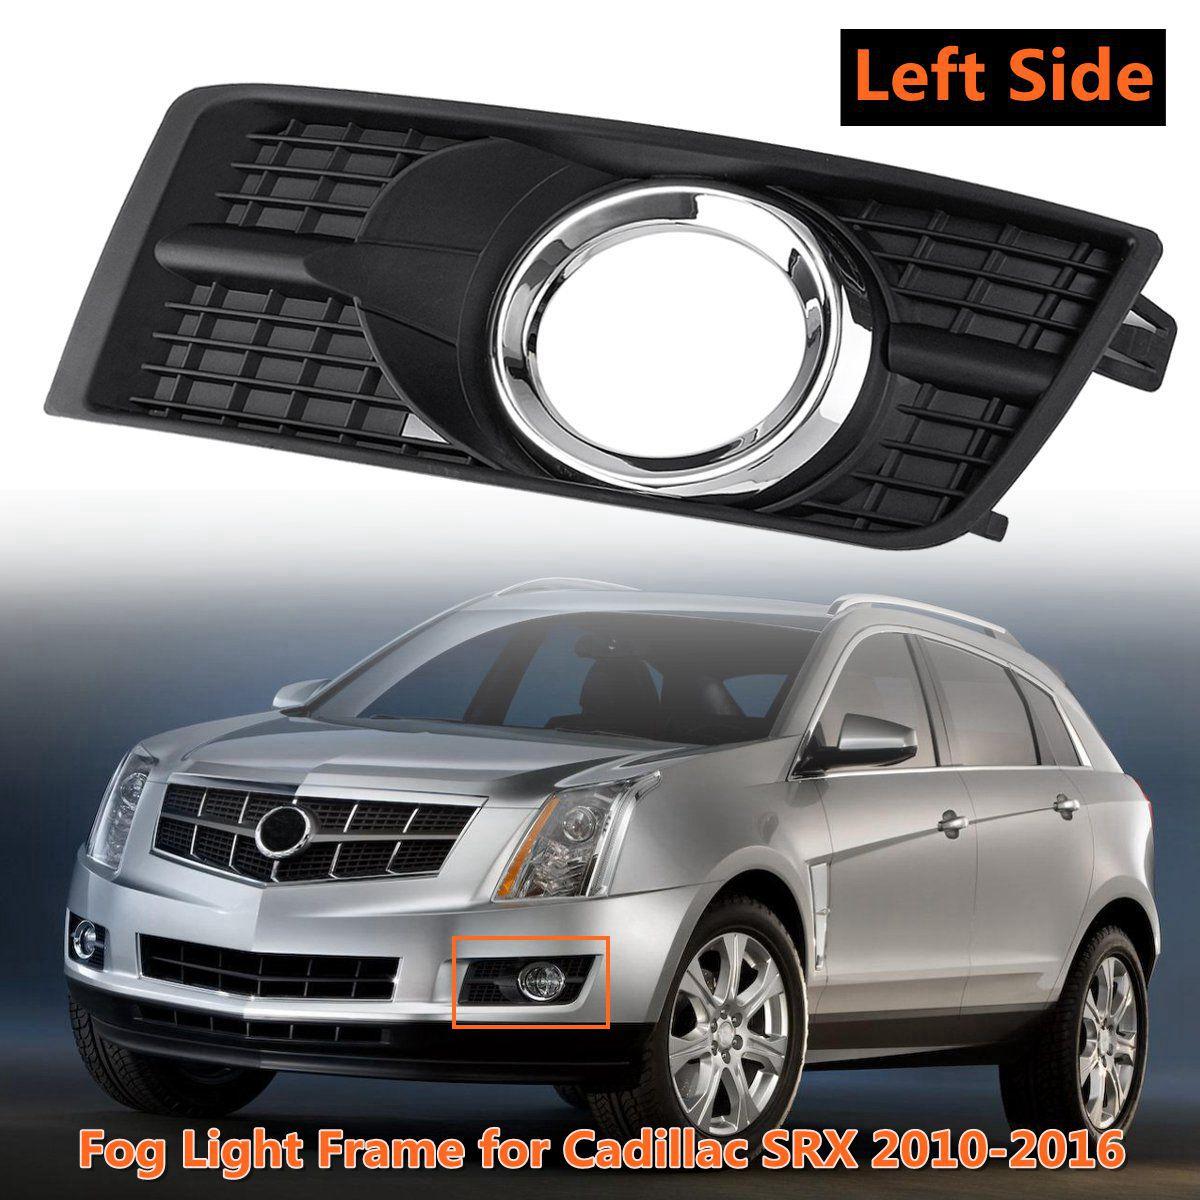 small resolution of front bumper fog light frame grilling cover foglamp trim shell cap garnish hood for cadillac srx